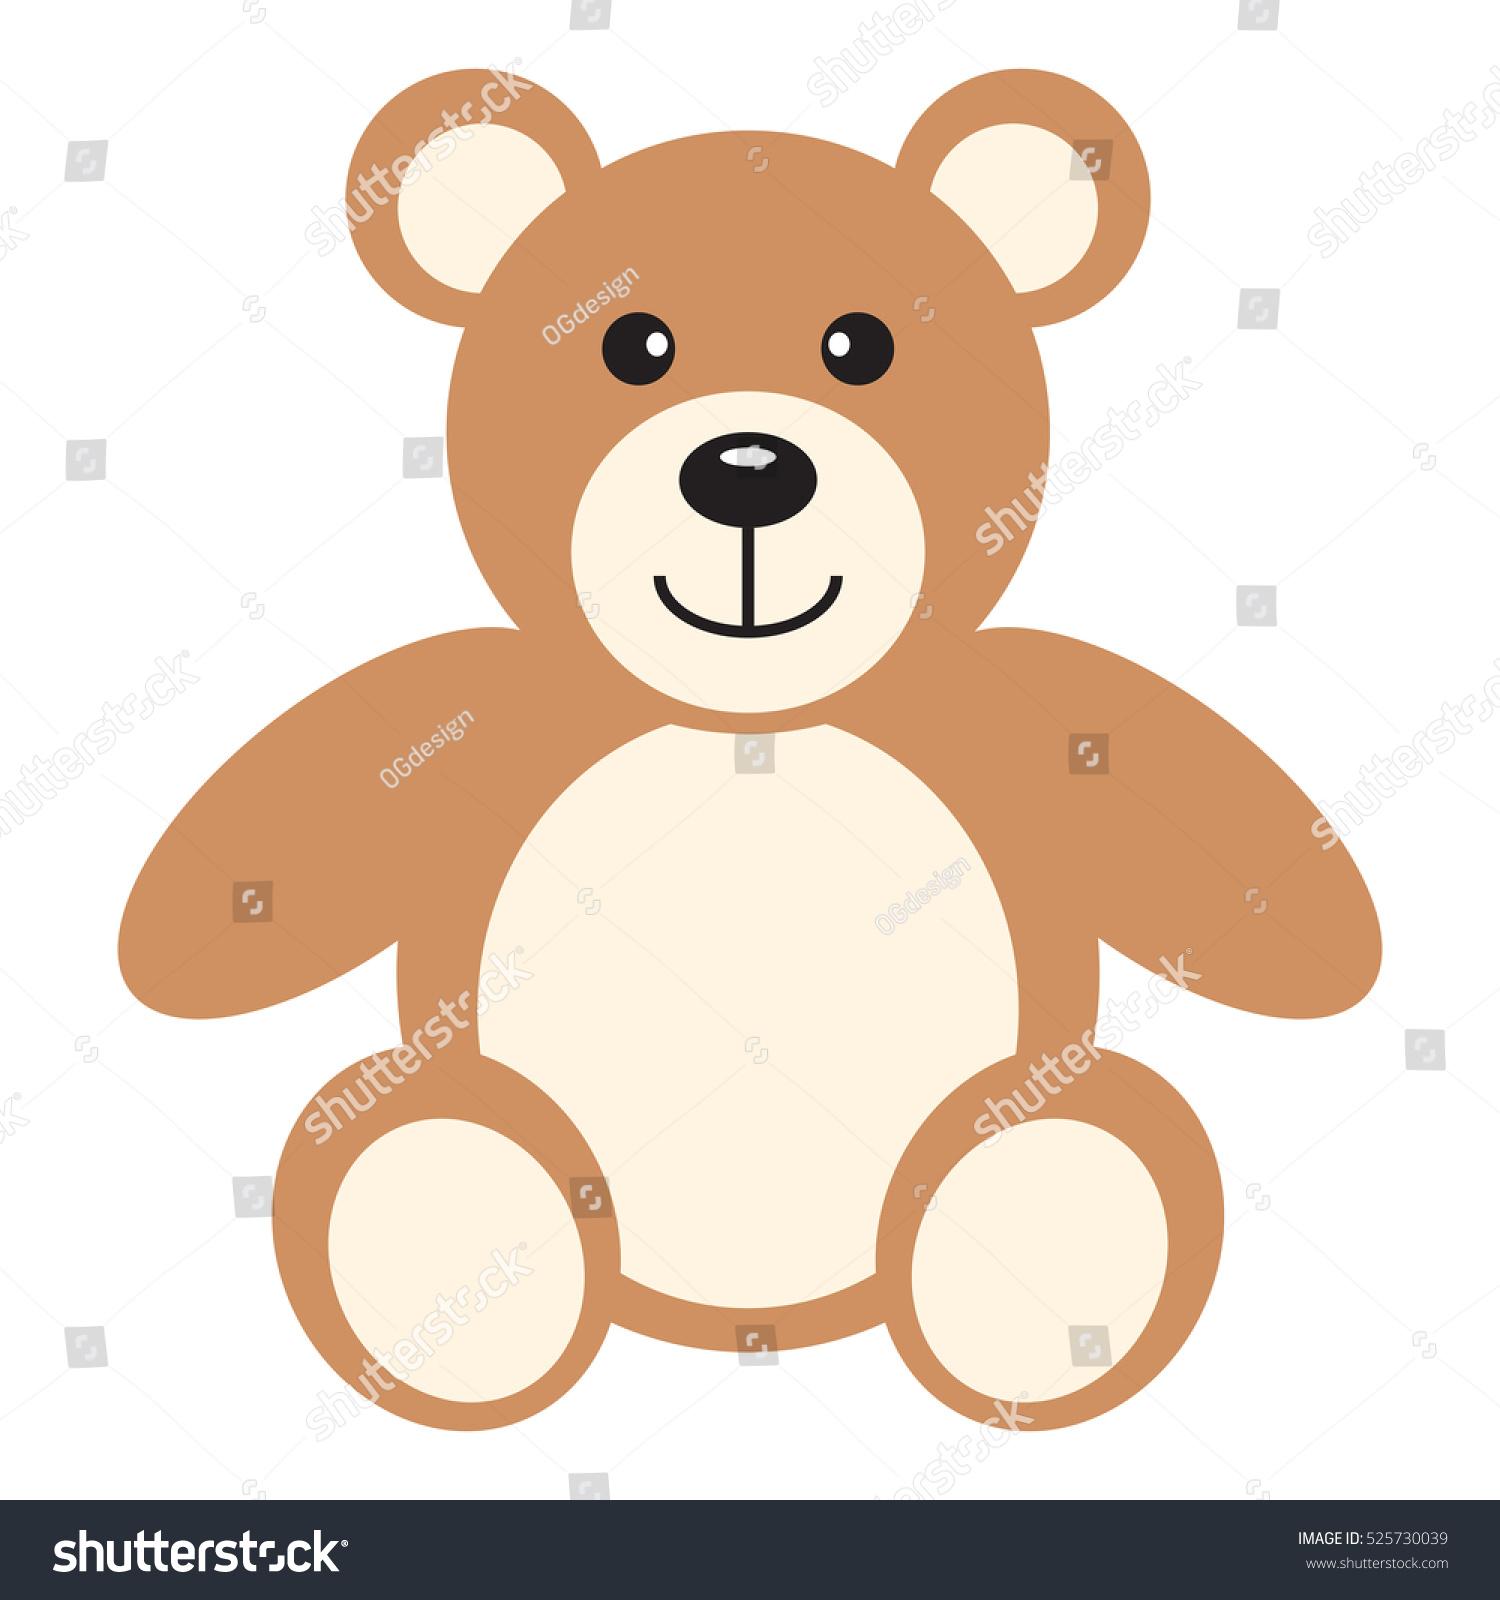 Flat Icon Teddy Bear Vector Illustration Stock-Vektorgrafik ...